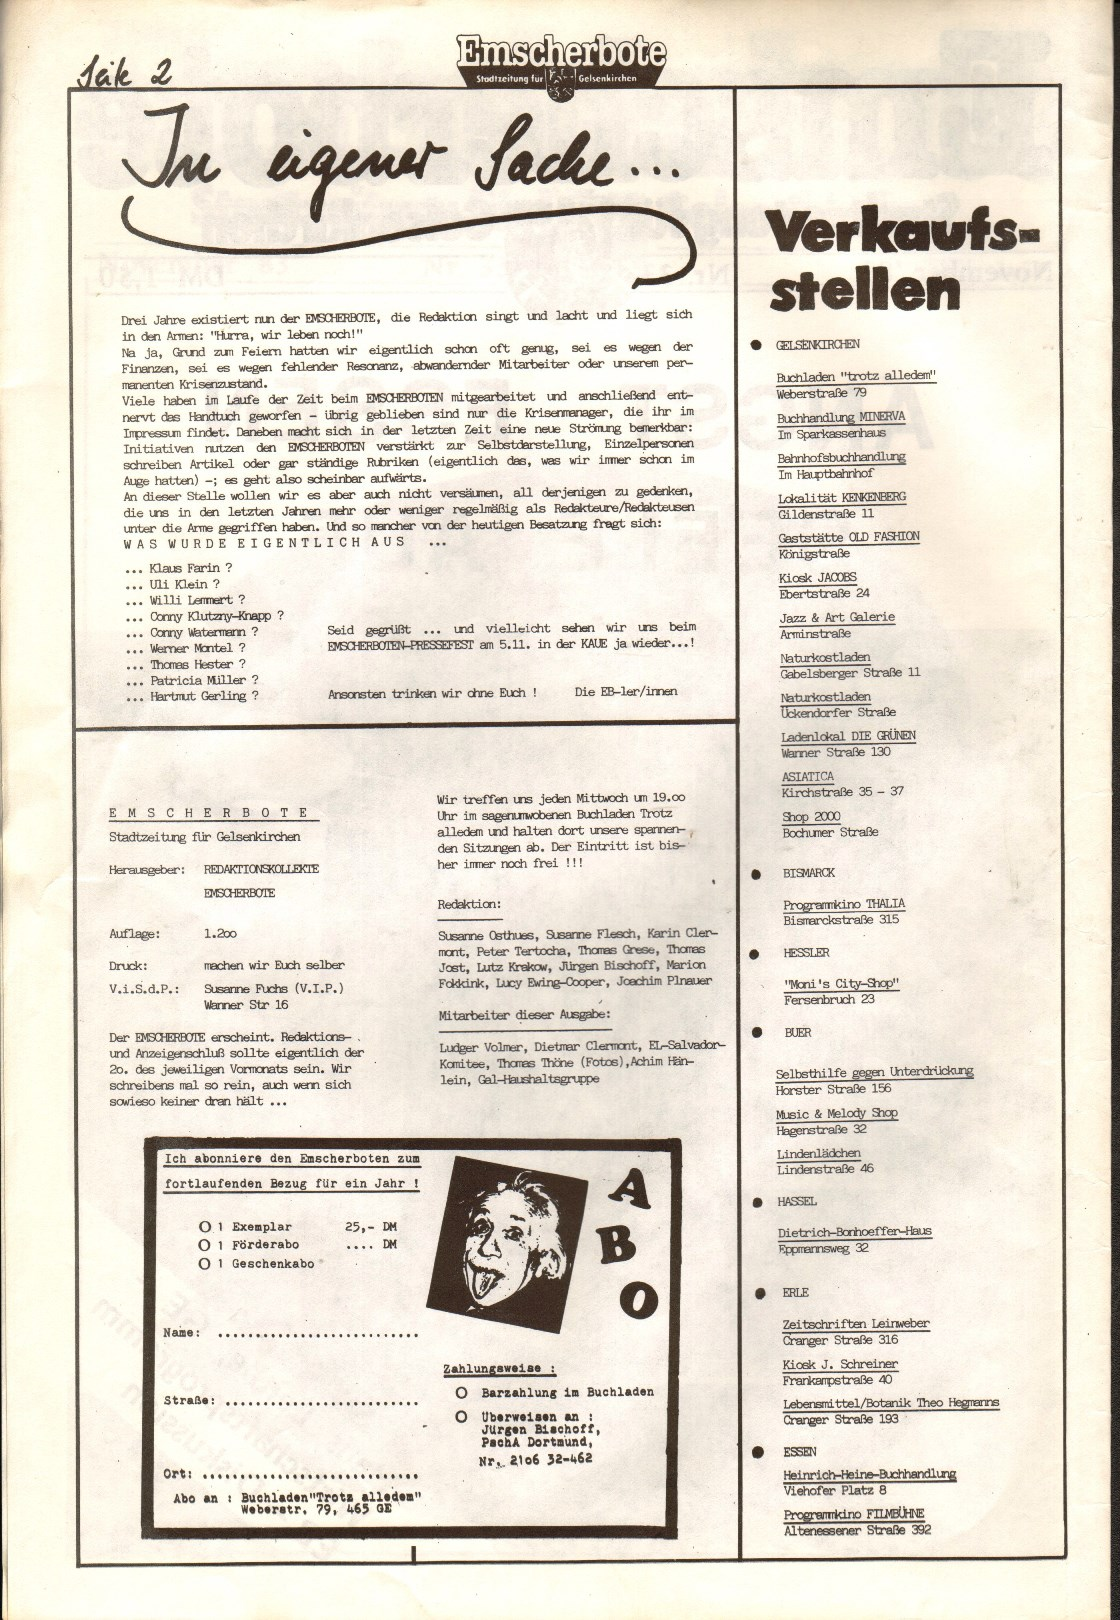 Gelsenkirchen_Emscherbote_1983_33_02